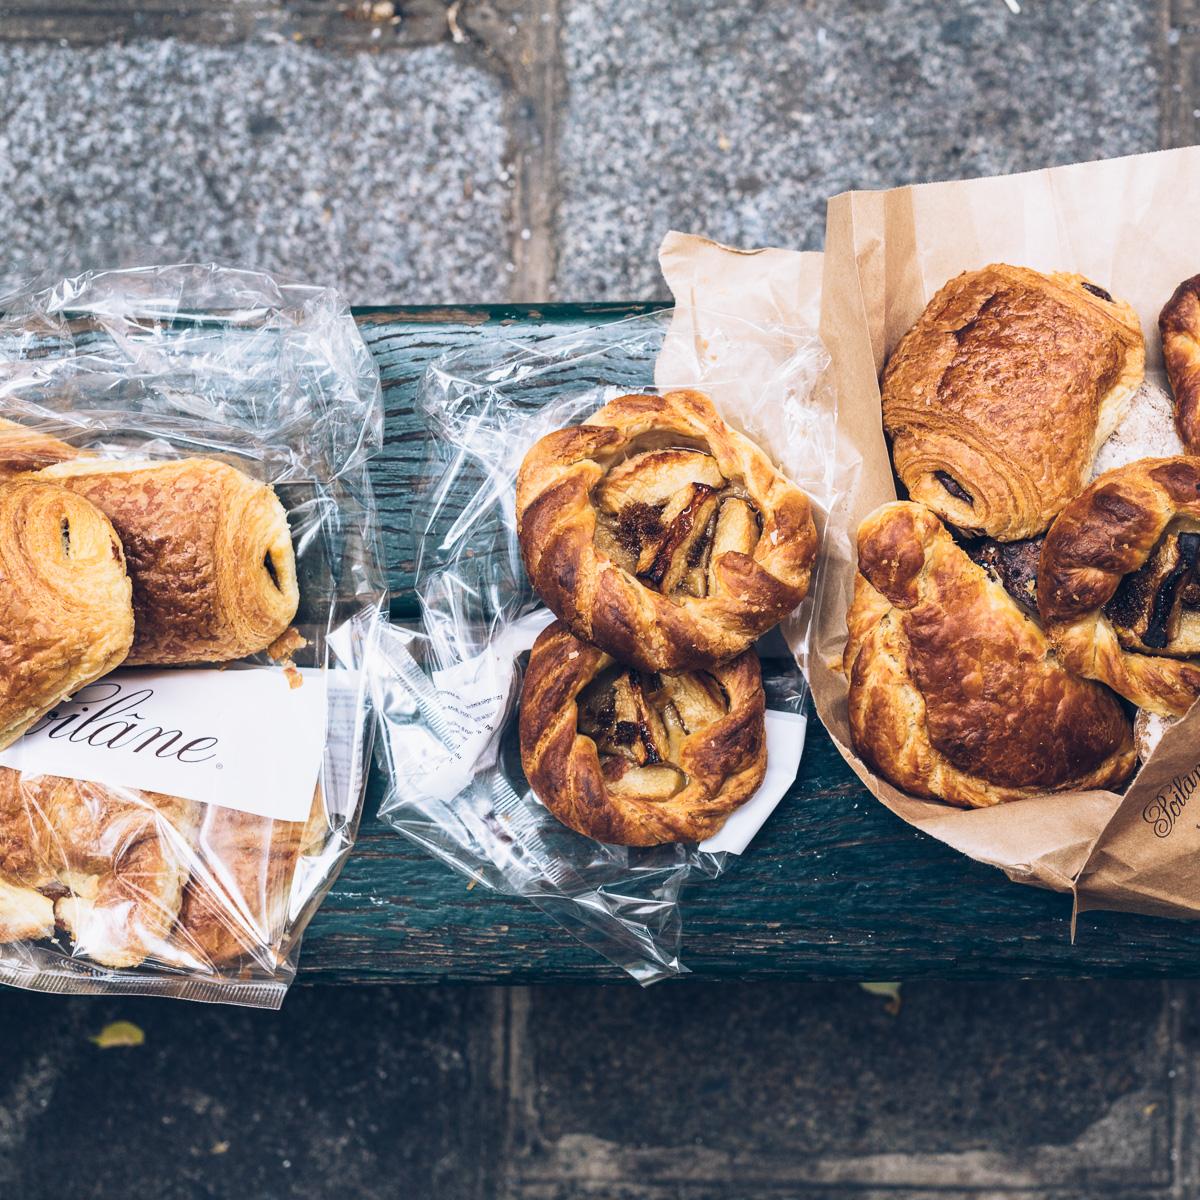 paris culinary tour with Olaiya Land of millys-kitchen.com